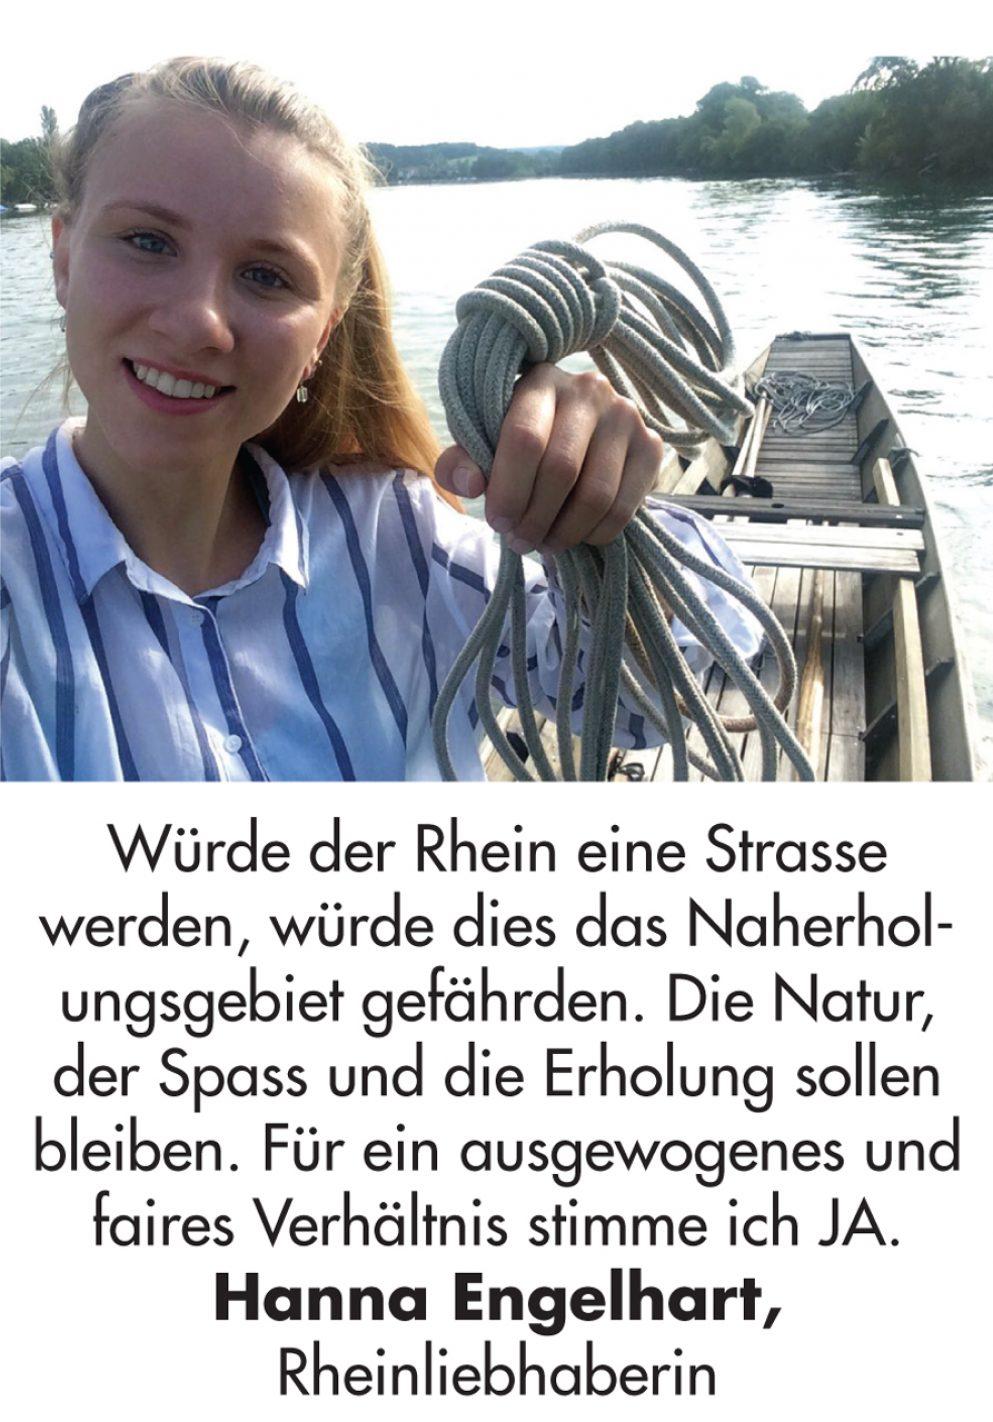 Hanna_Engelhart